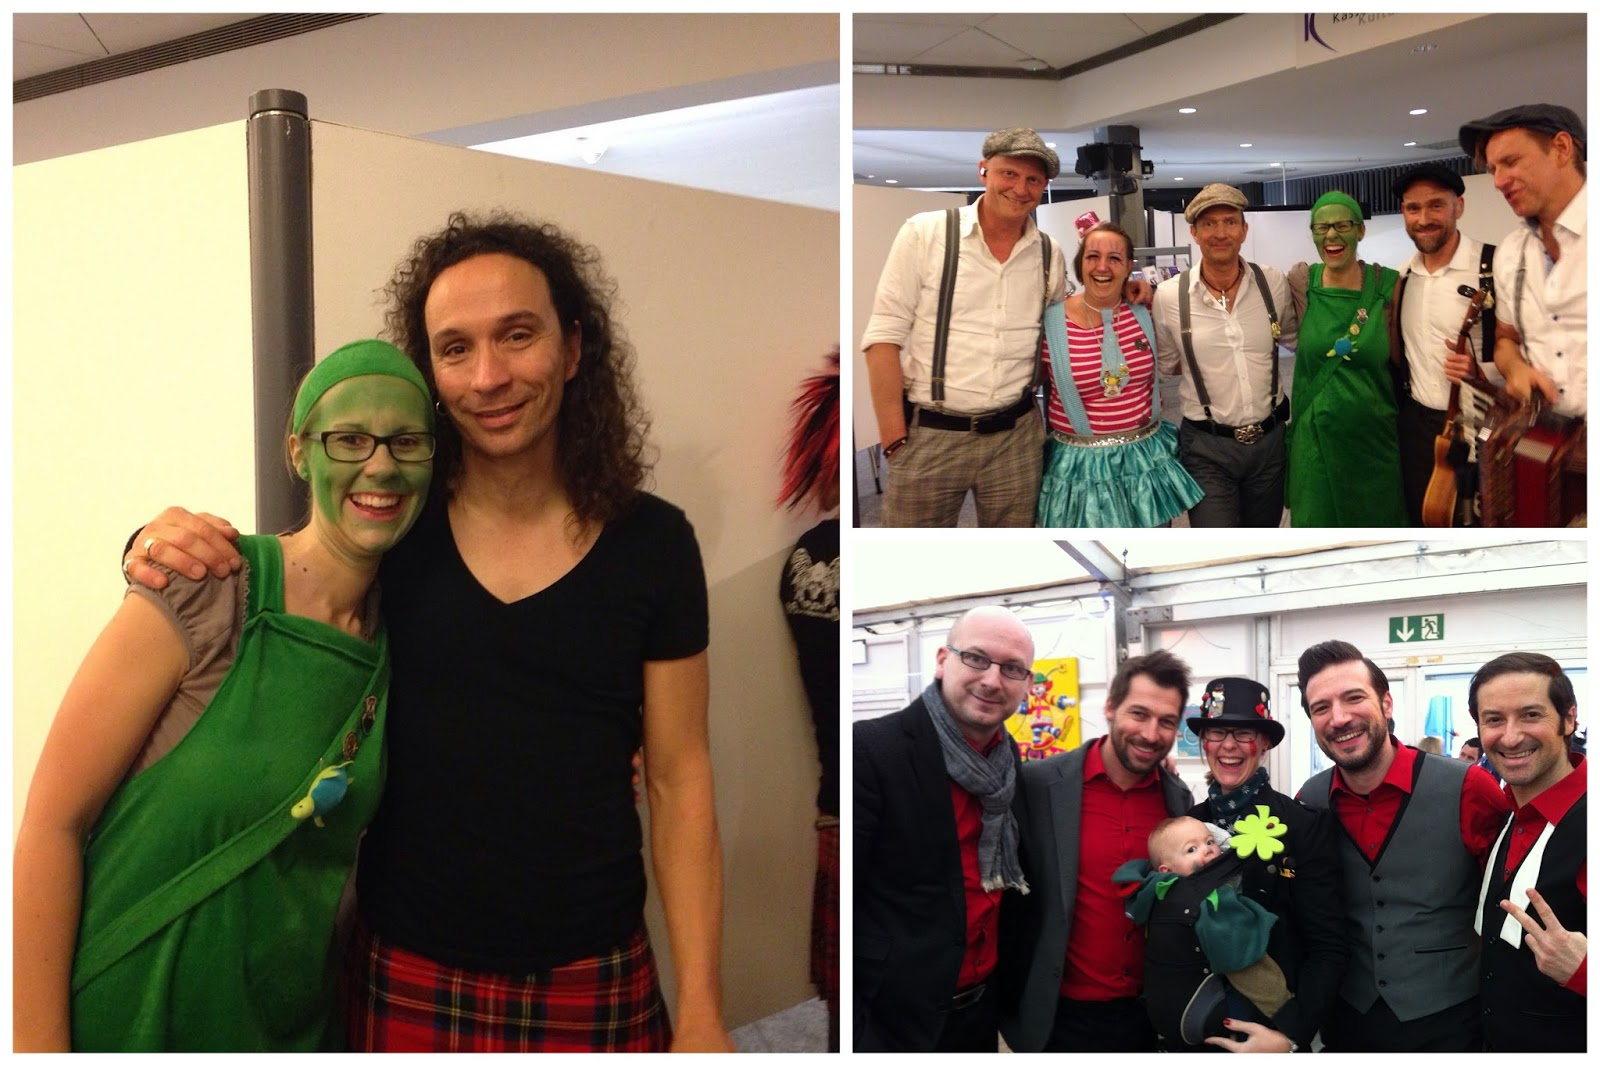 Koelsche Toen Karnevalsbands Koeln Brings Kluengelkoepp Wanderer